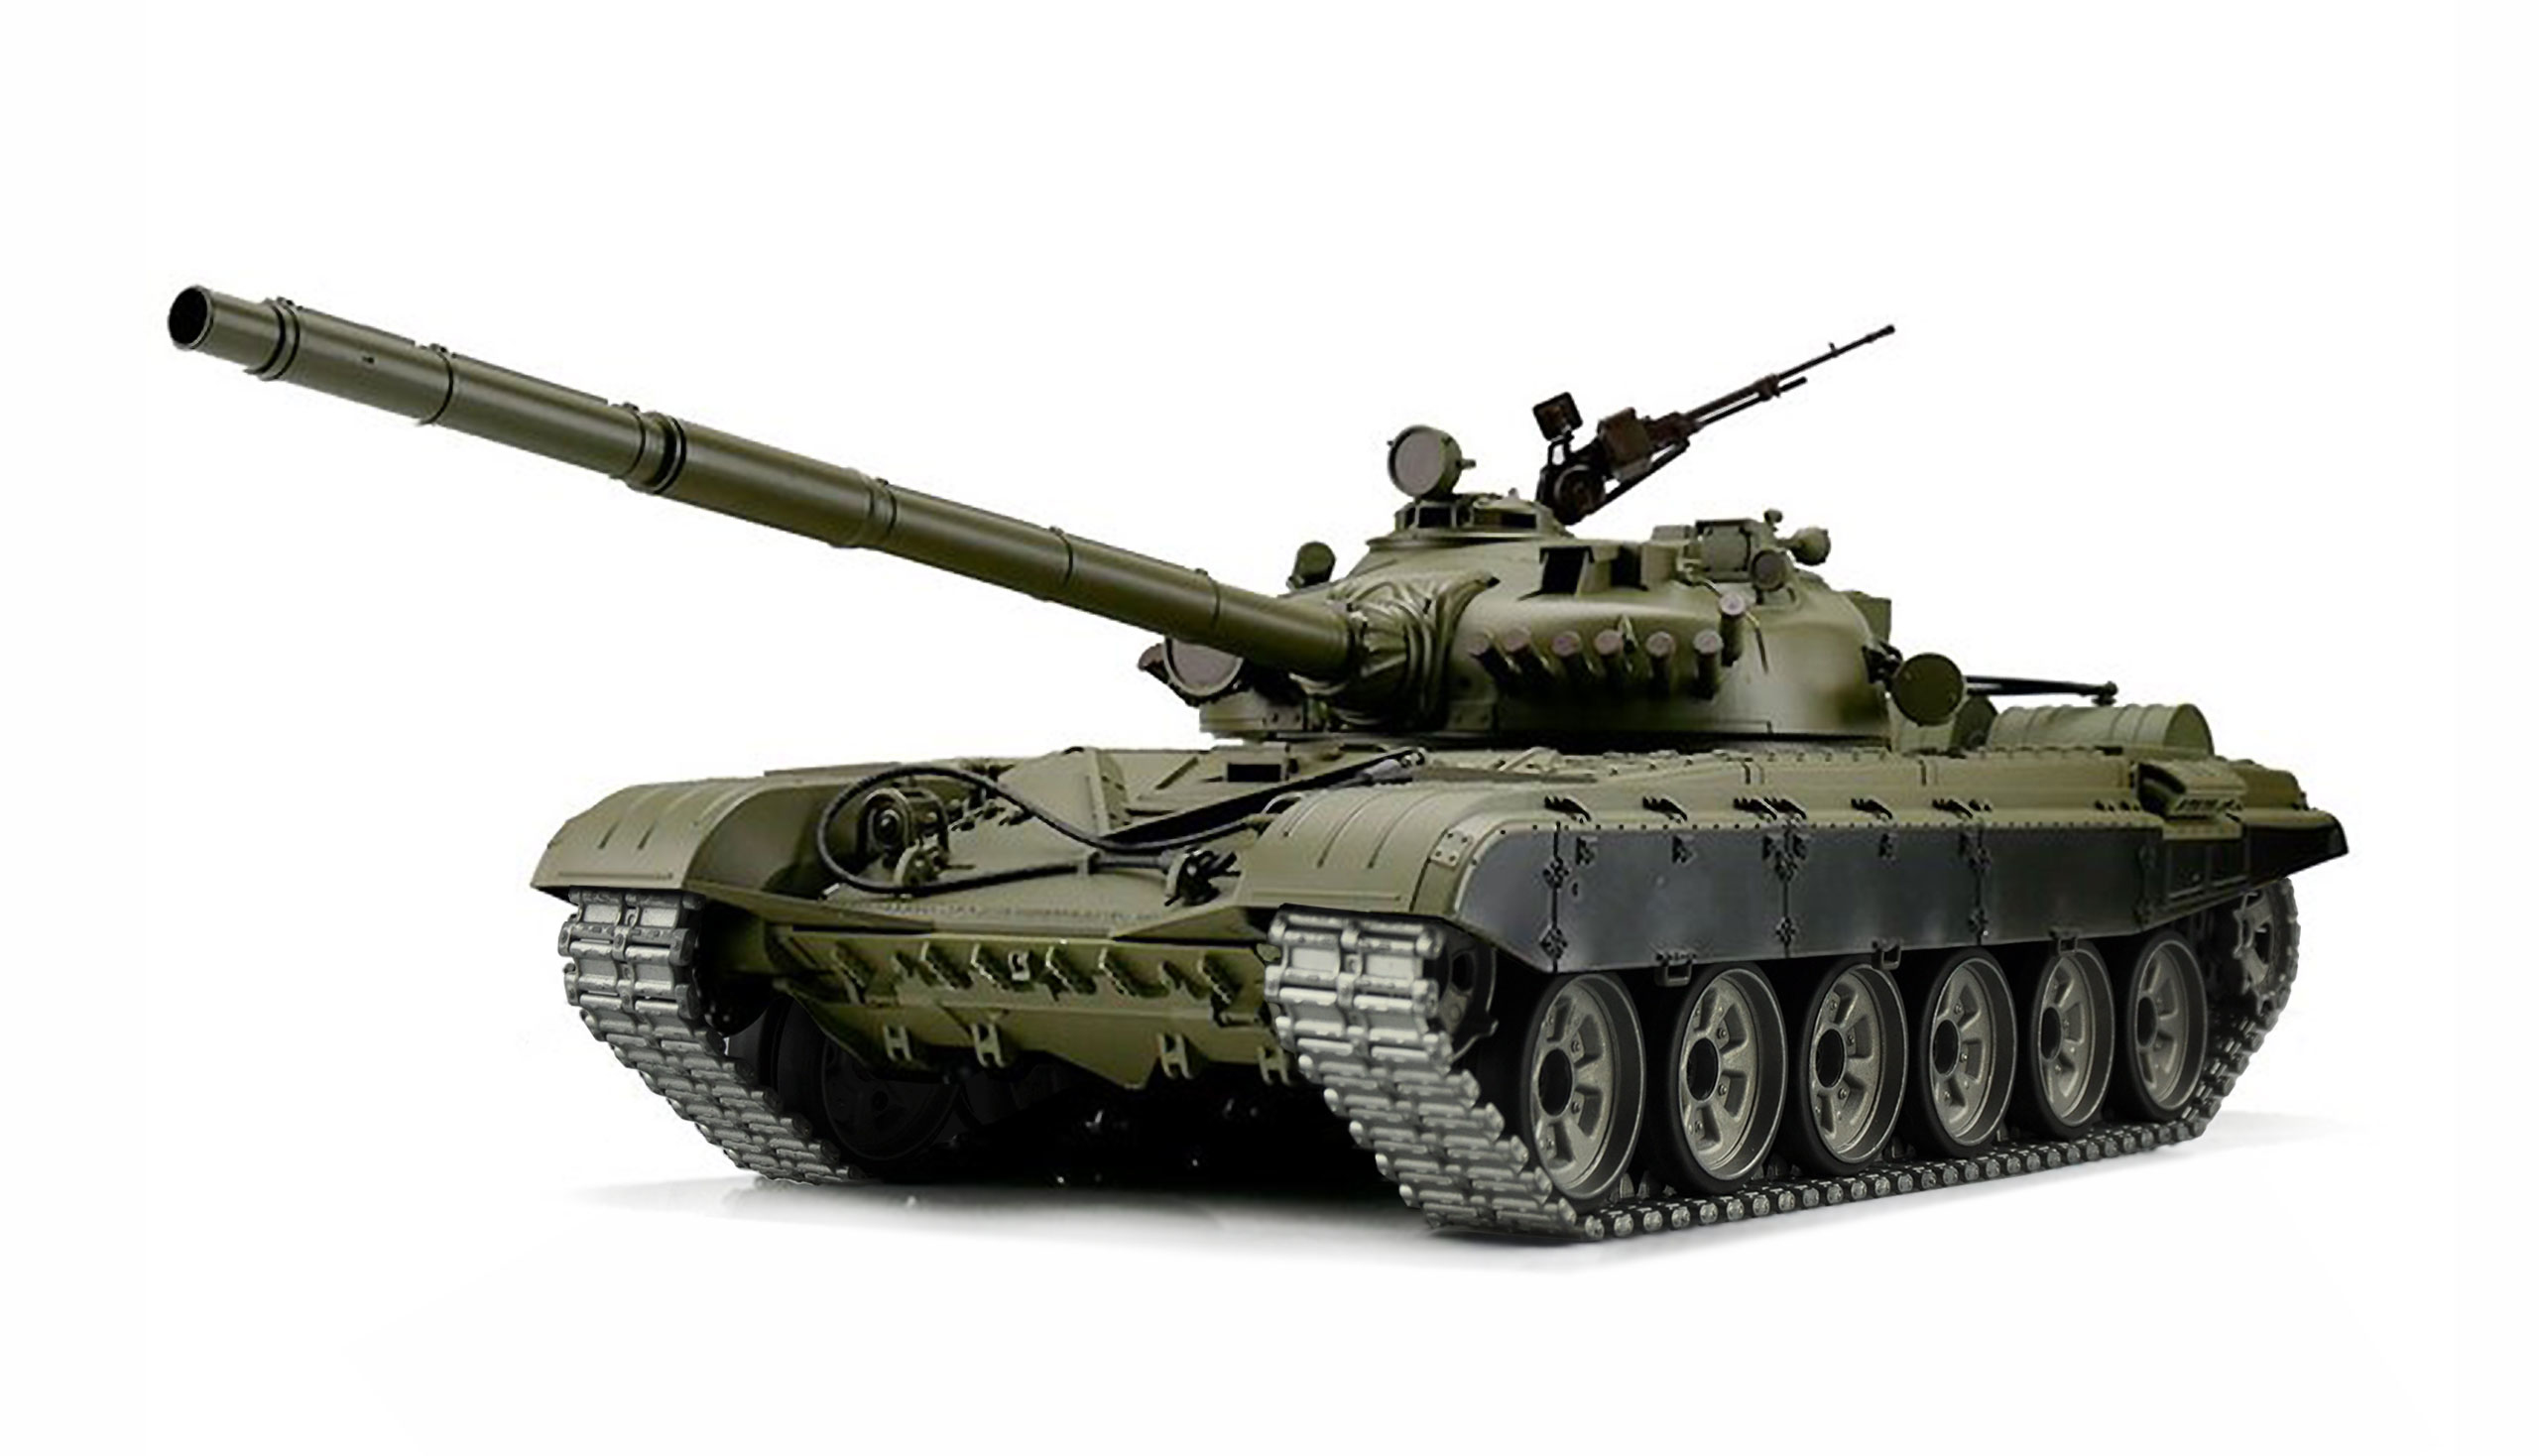 Amewi T-72 - Funkgesteuerter (RC) Panzer - Elektromotor - 1:16 - Betriebsbereit (RTR) - Junge - 14 Jahr(e)